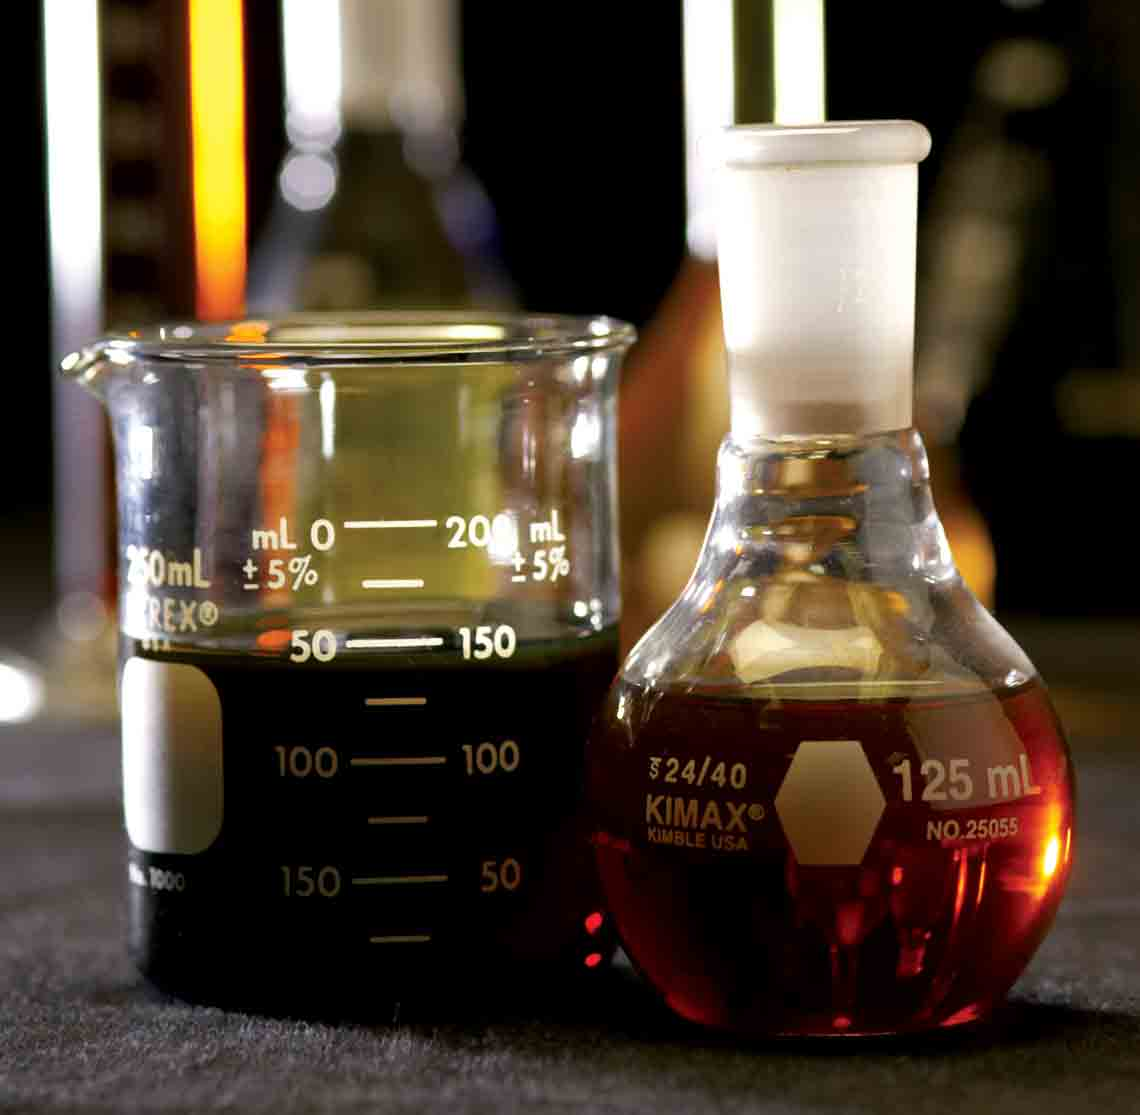 Surface sampling fluids